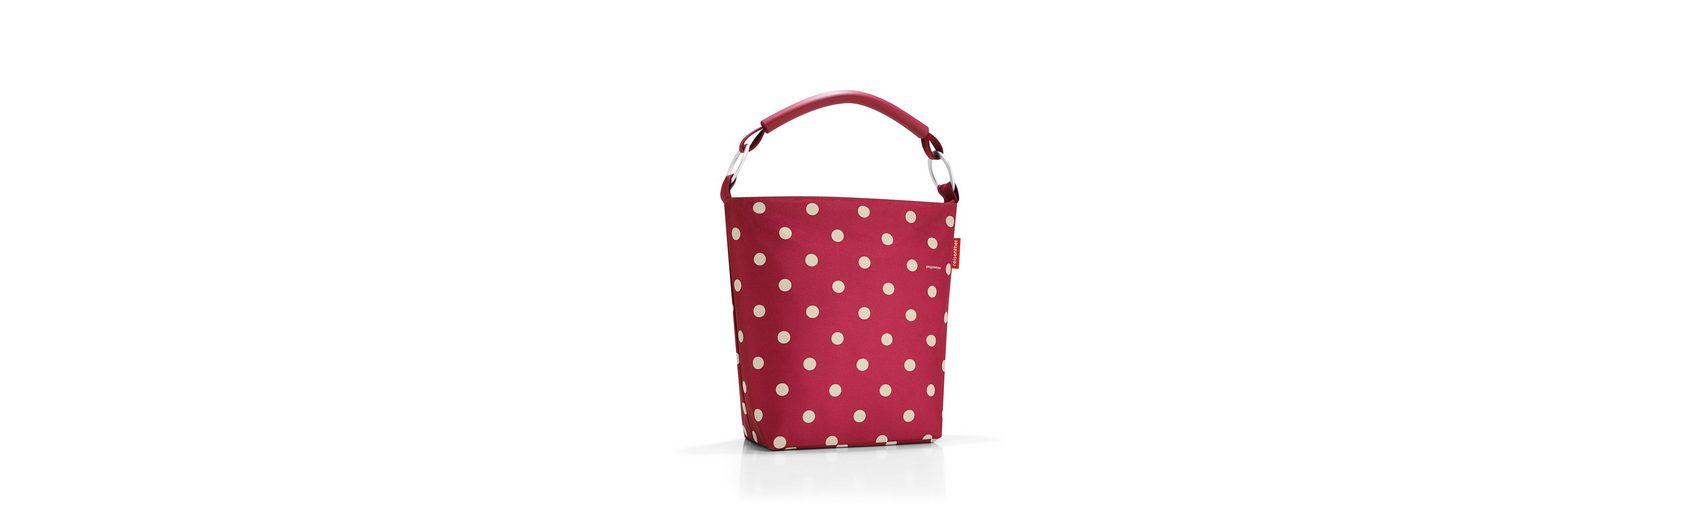 Reisenthel® Ringbag L ruby dots